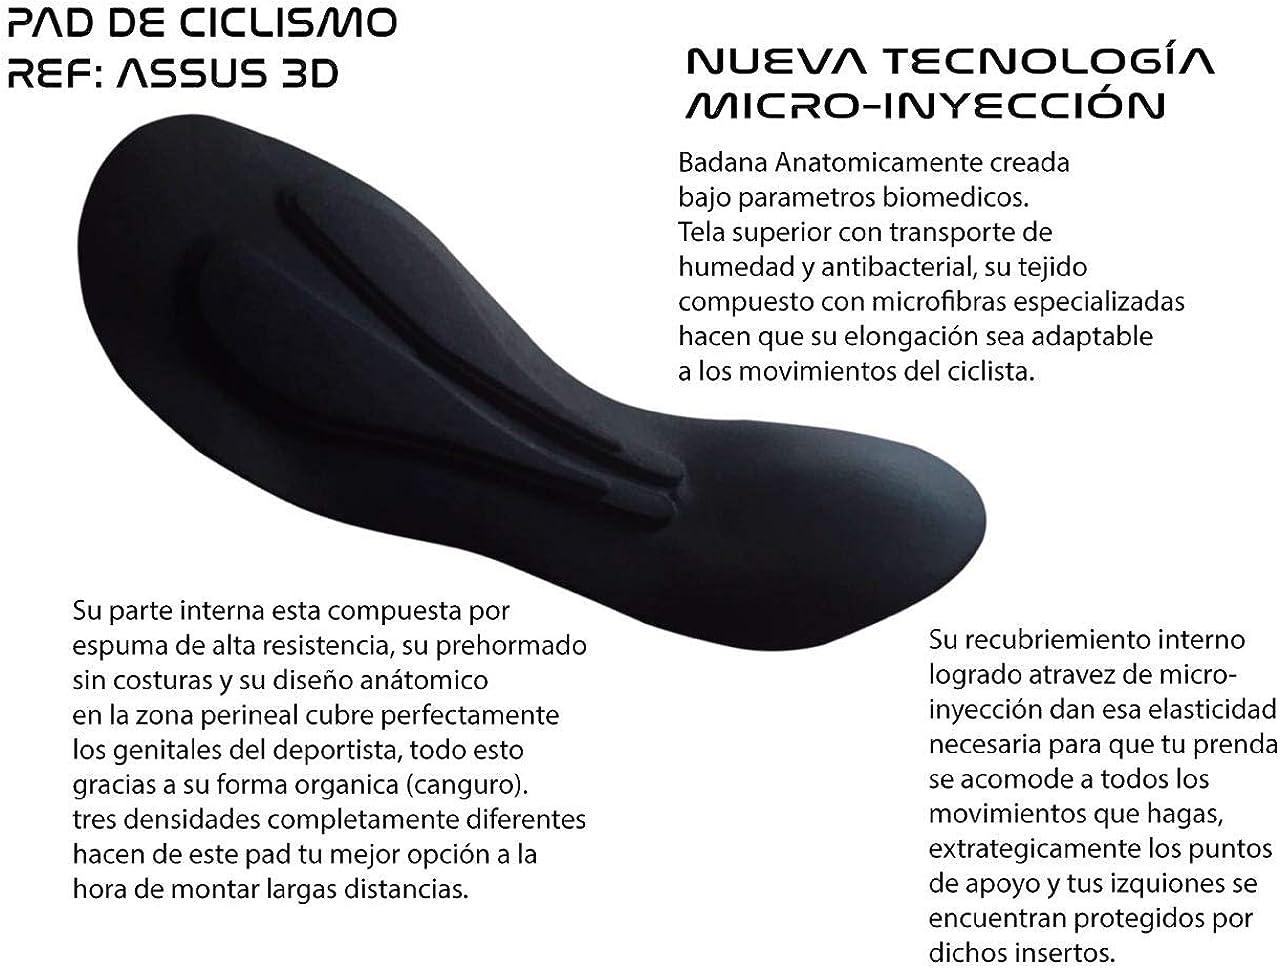 Premium Womens Ultra Slim fit 3D Padded Cycling Bike Bib Short Pro UV Wicking 81250111512 